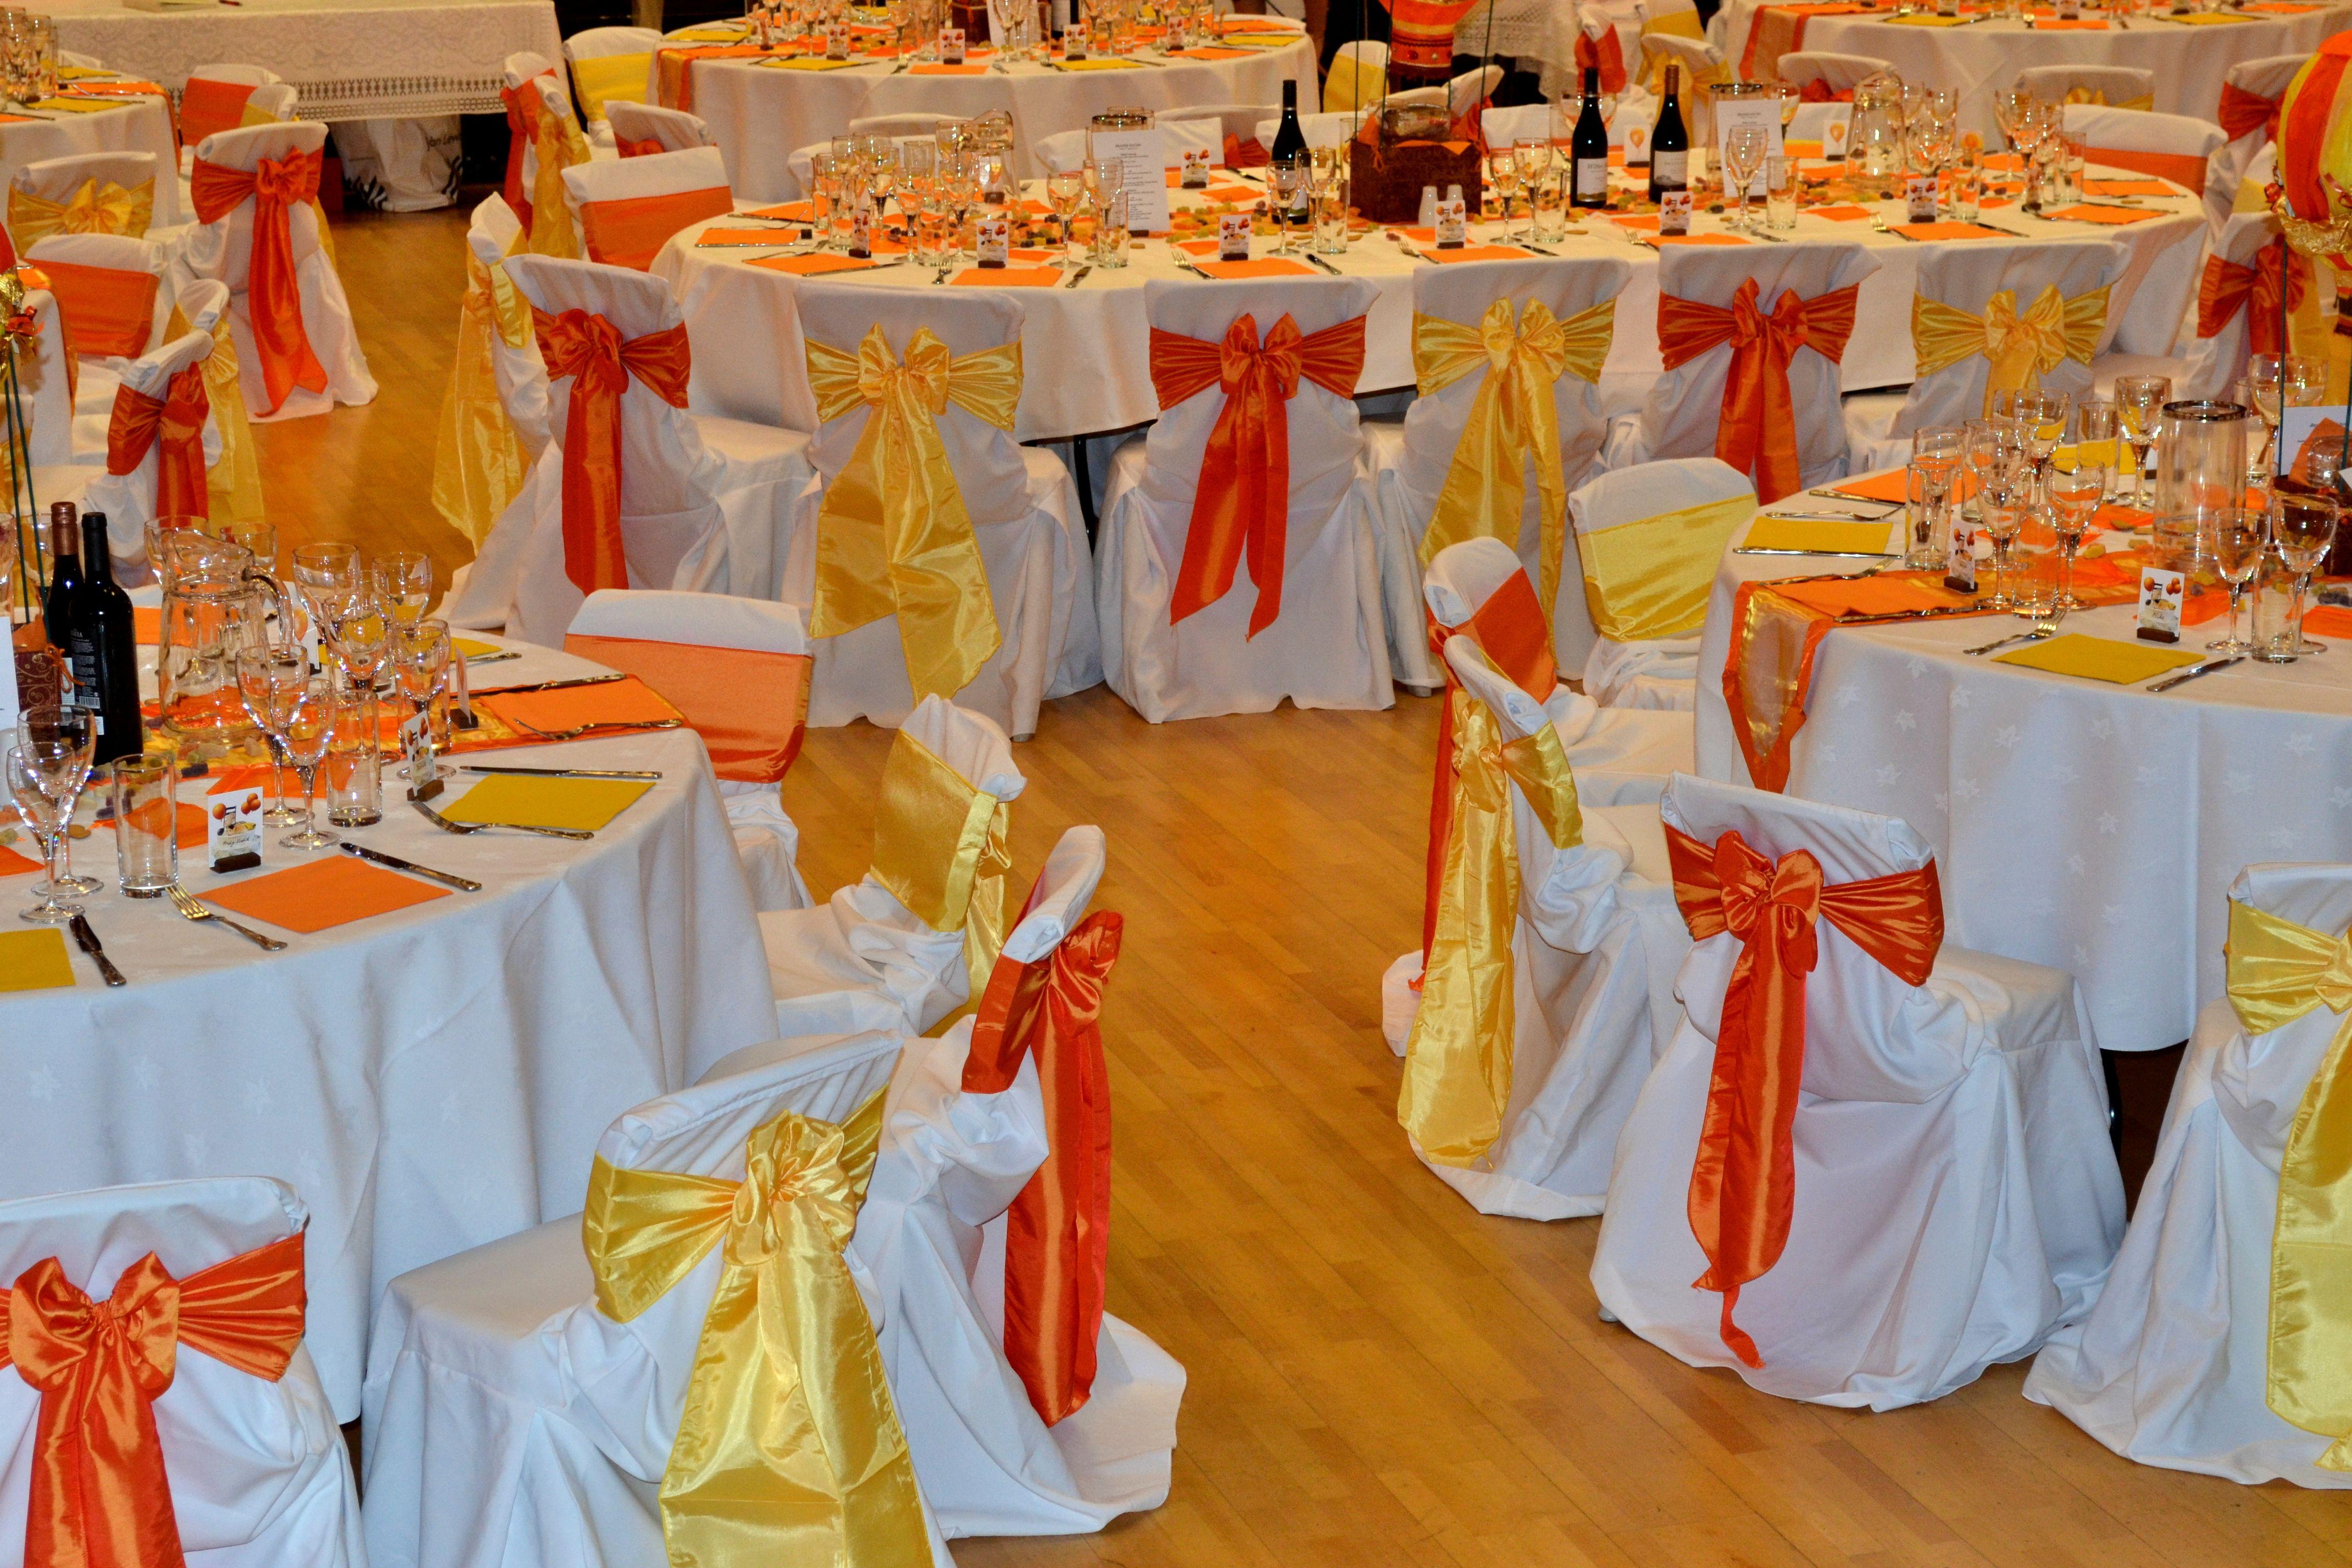 Alternating Orange and Yellow Satin Bows on White Chair